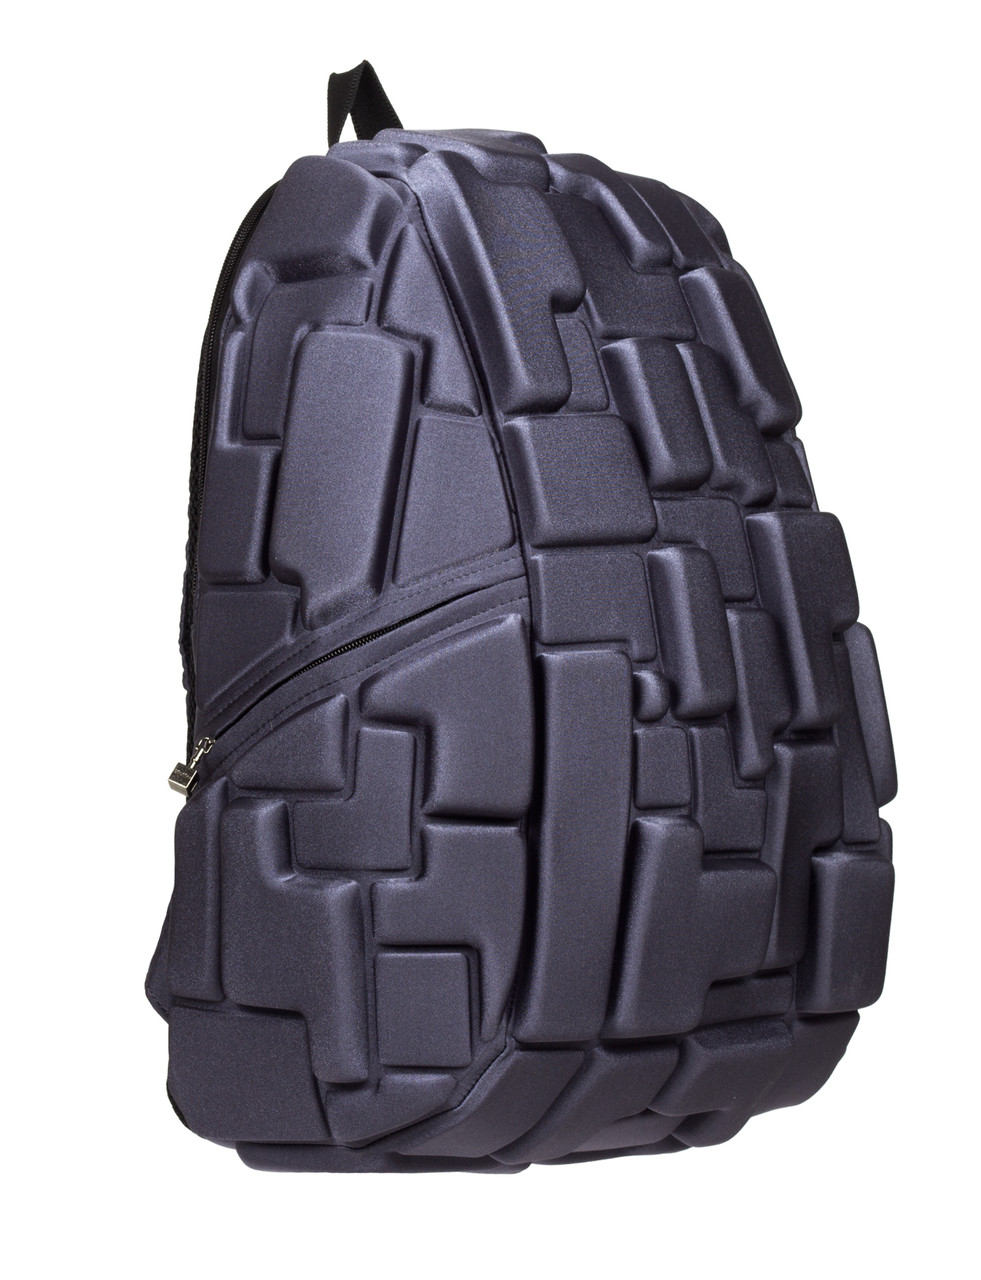 Рюкзак MadPax Blok Metallics Full цвет OUTER LIMIT (графит)